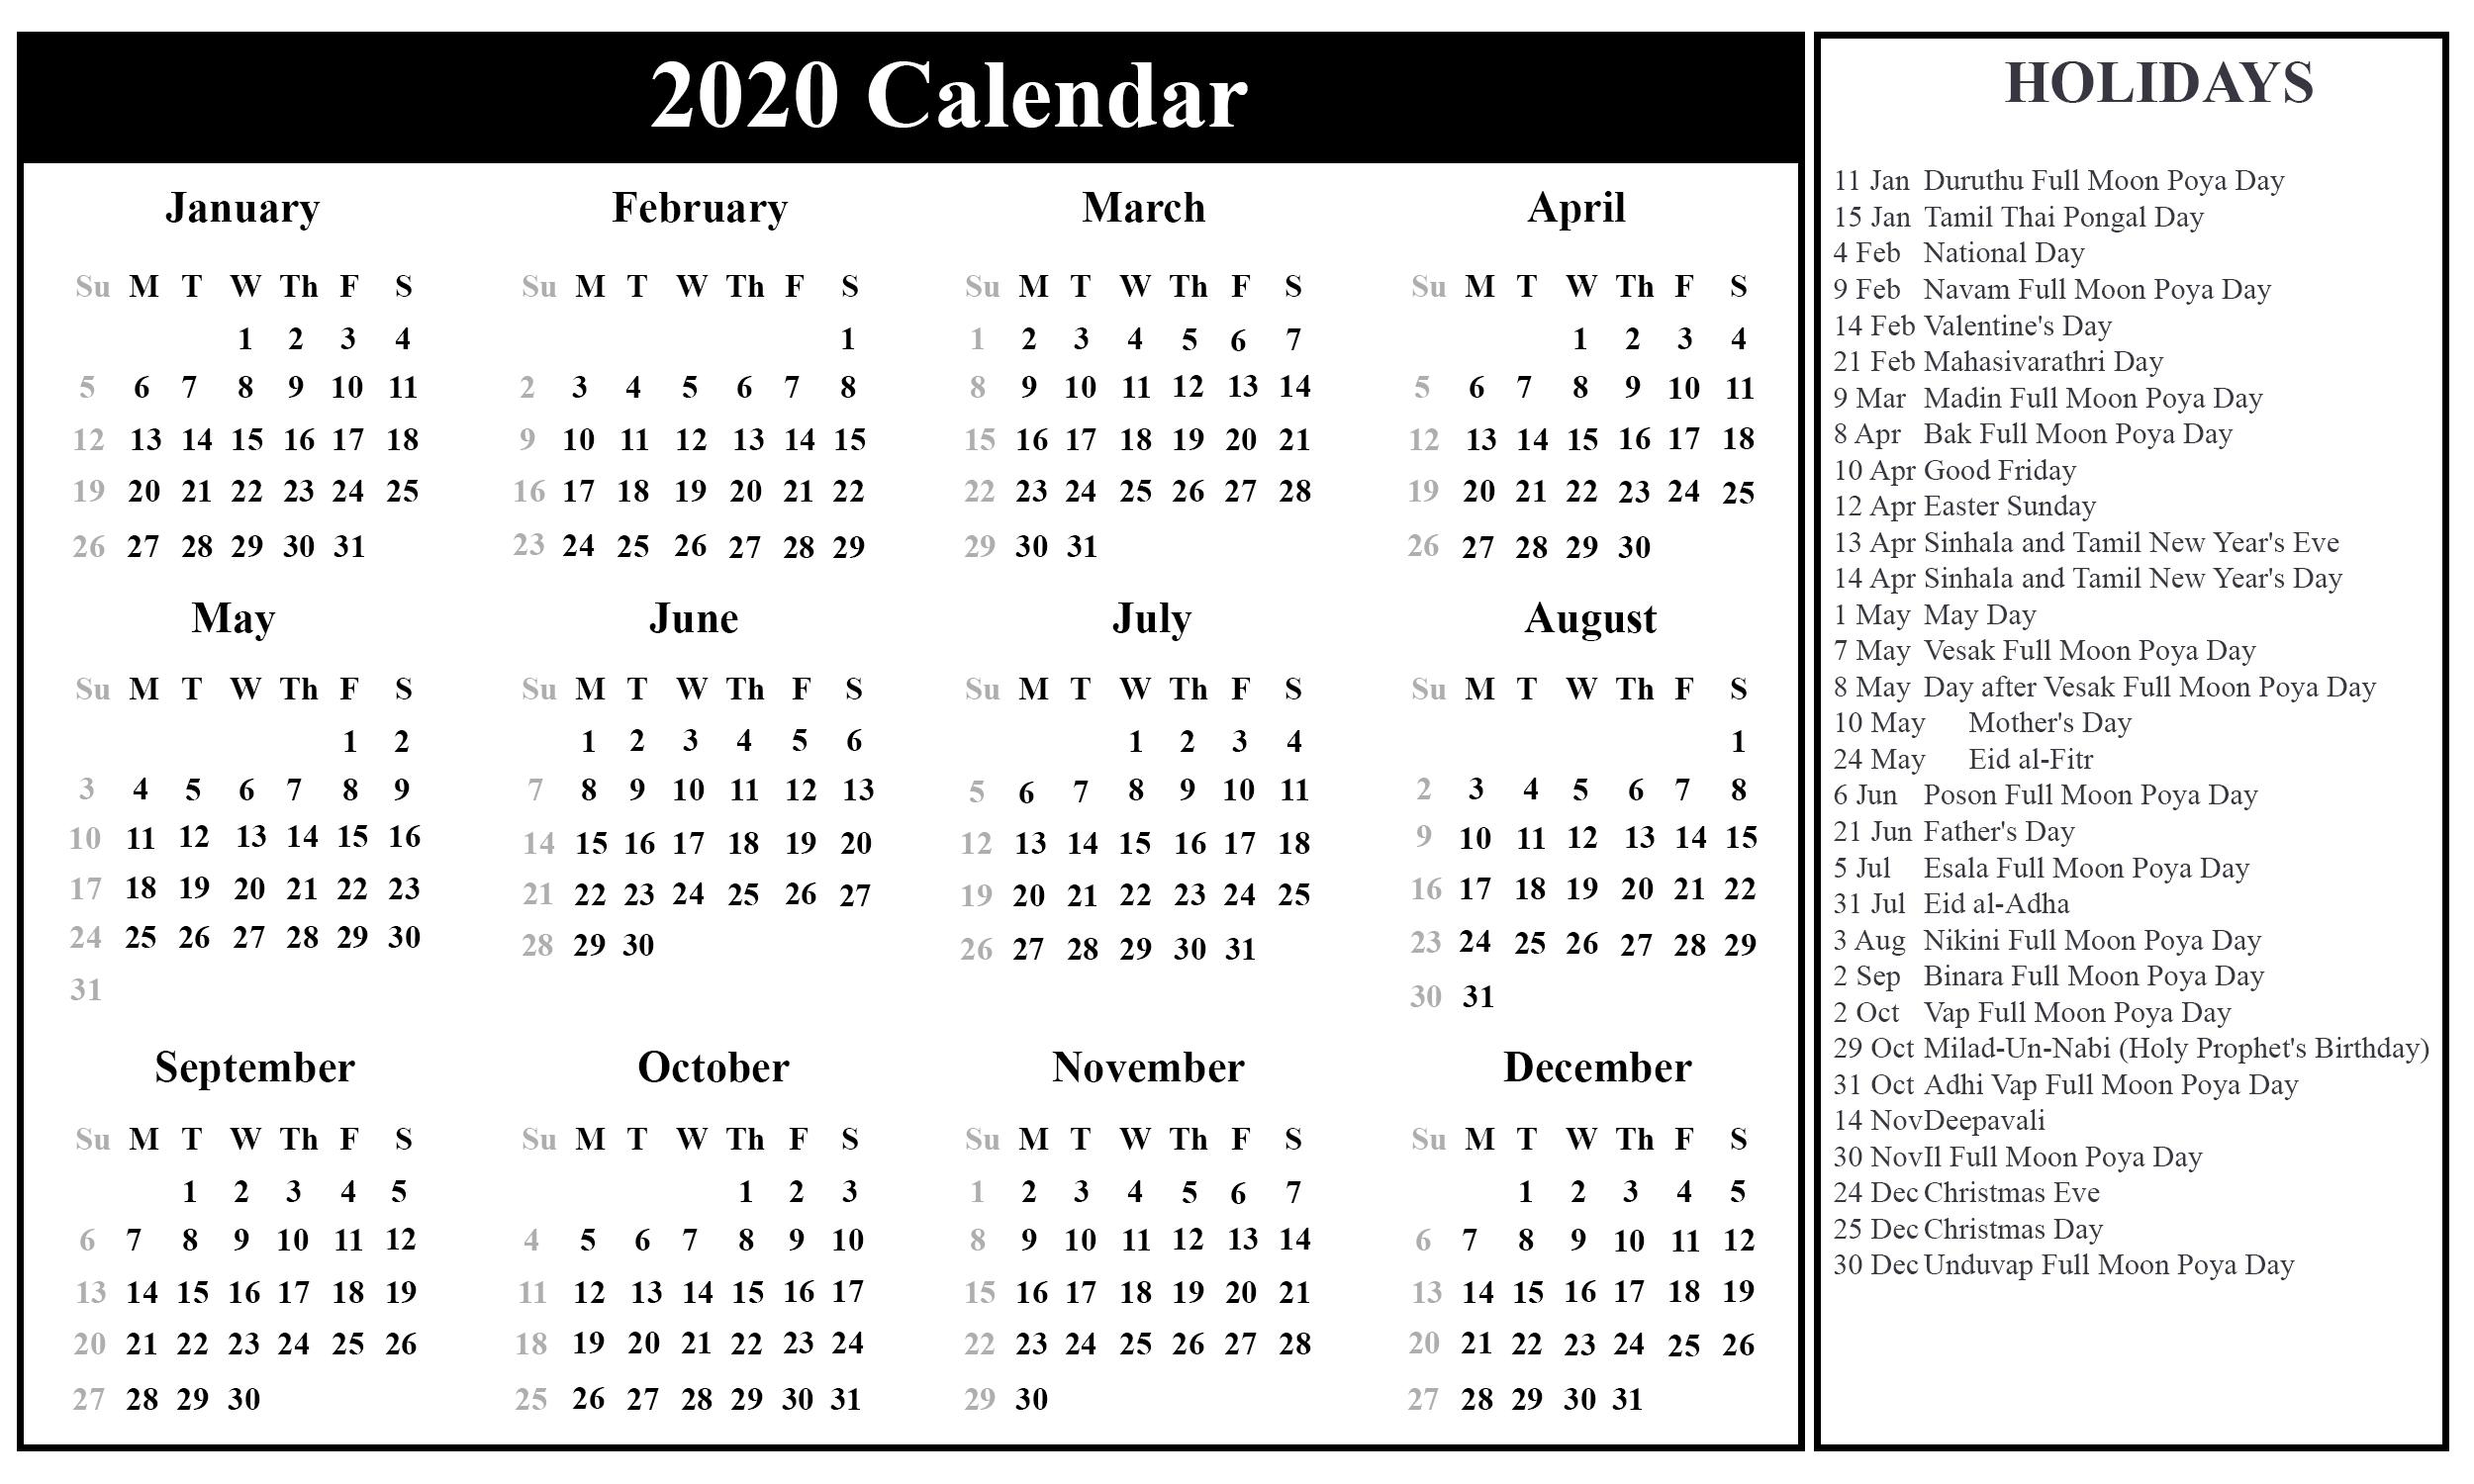 Printable August Calendar Template-Calendar 2020 Printable Holidays Special